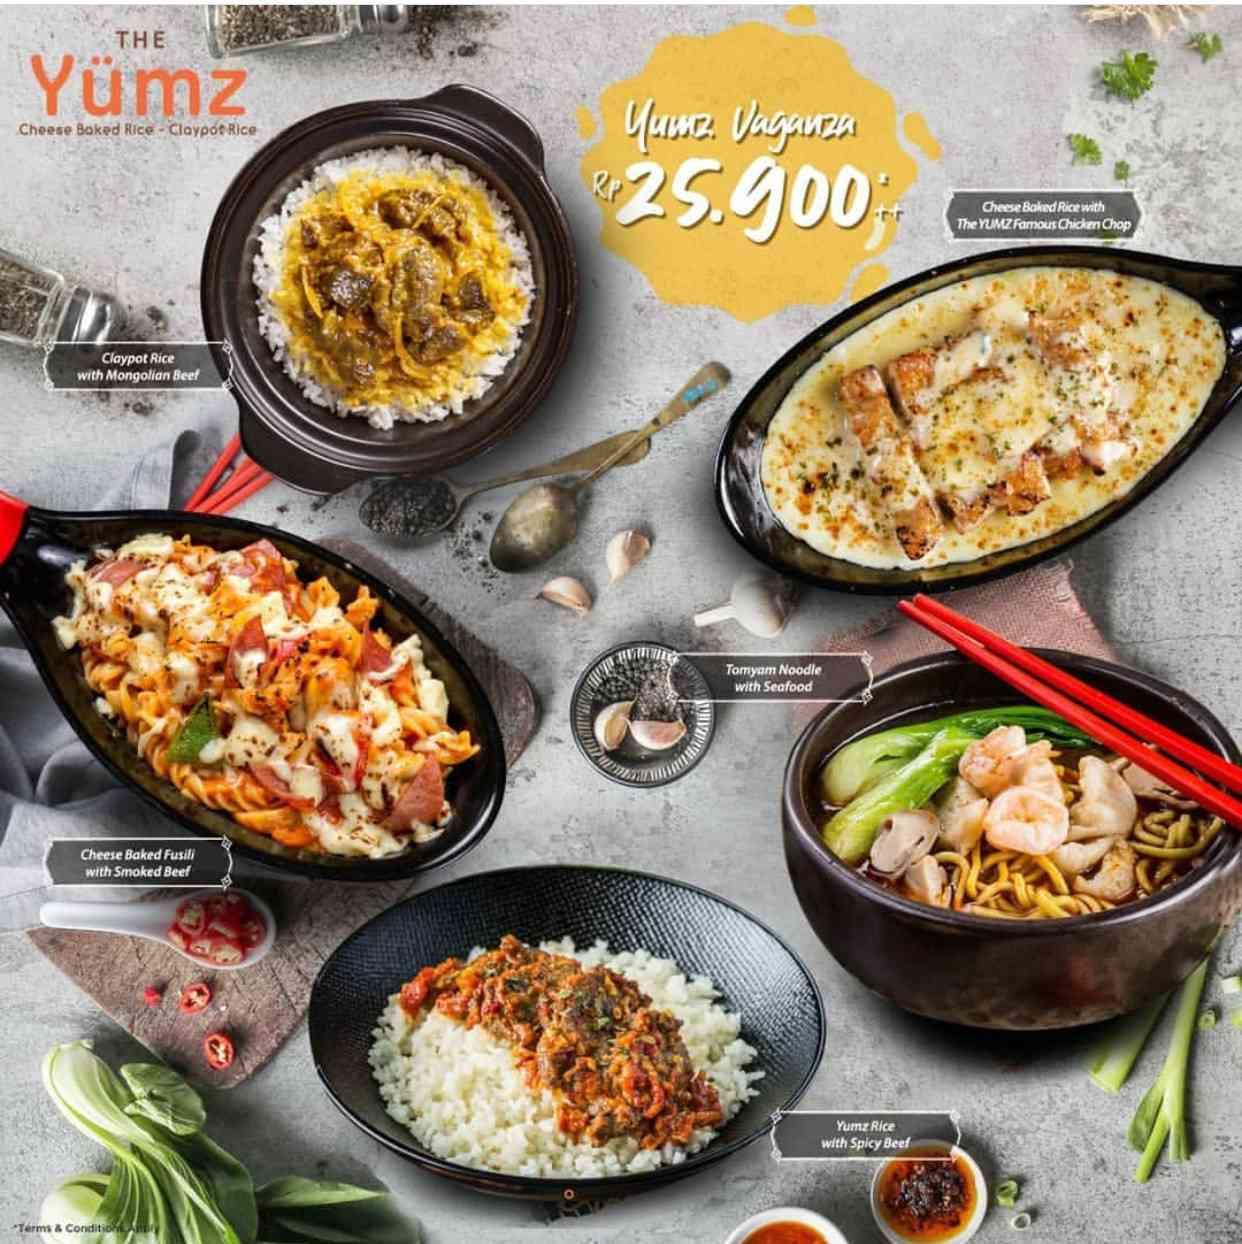 The Yumz Promo Yumz Vaganza Harga Spesial Menu Pilihan hanya Rp. 25.900++